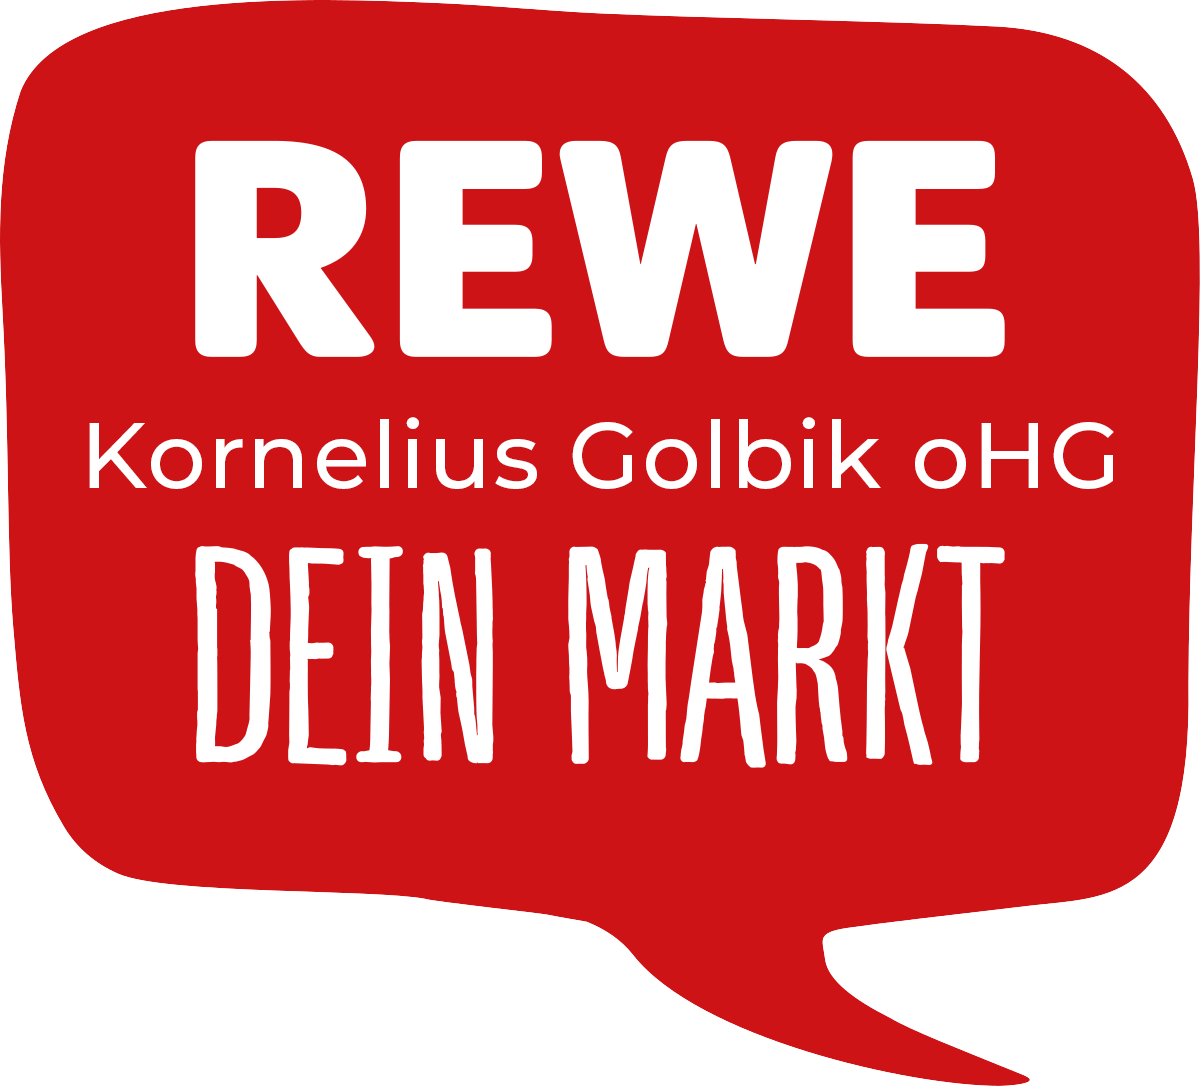 Rewe Kornelius Golbik OHG